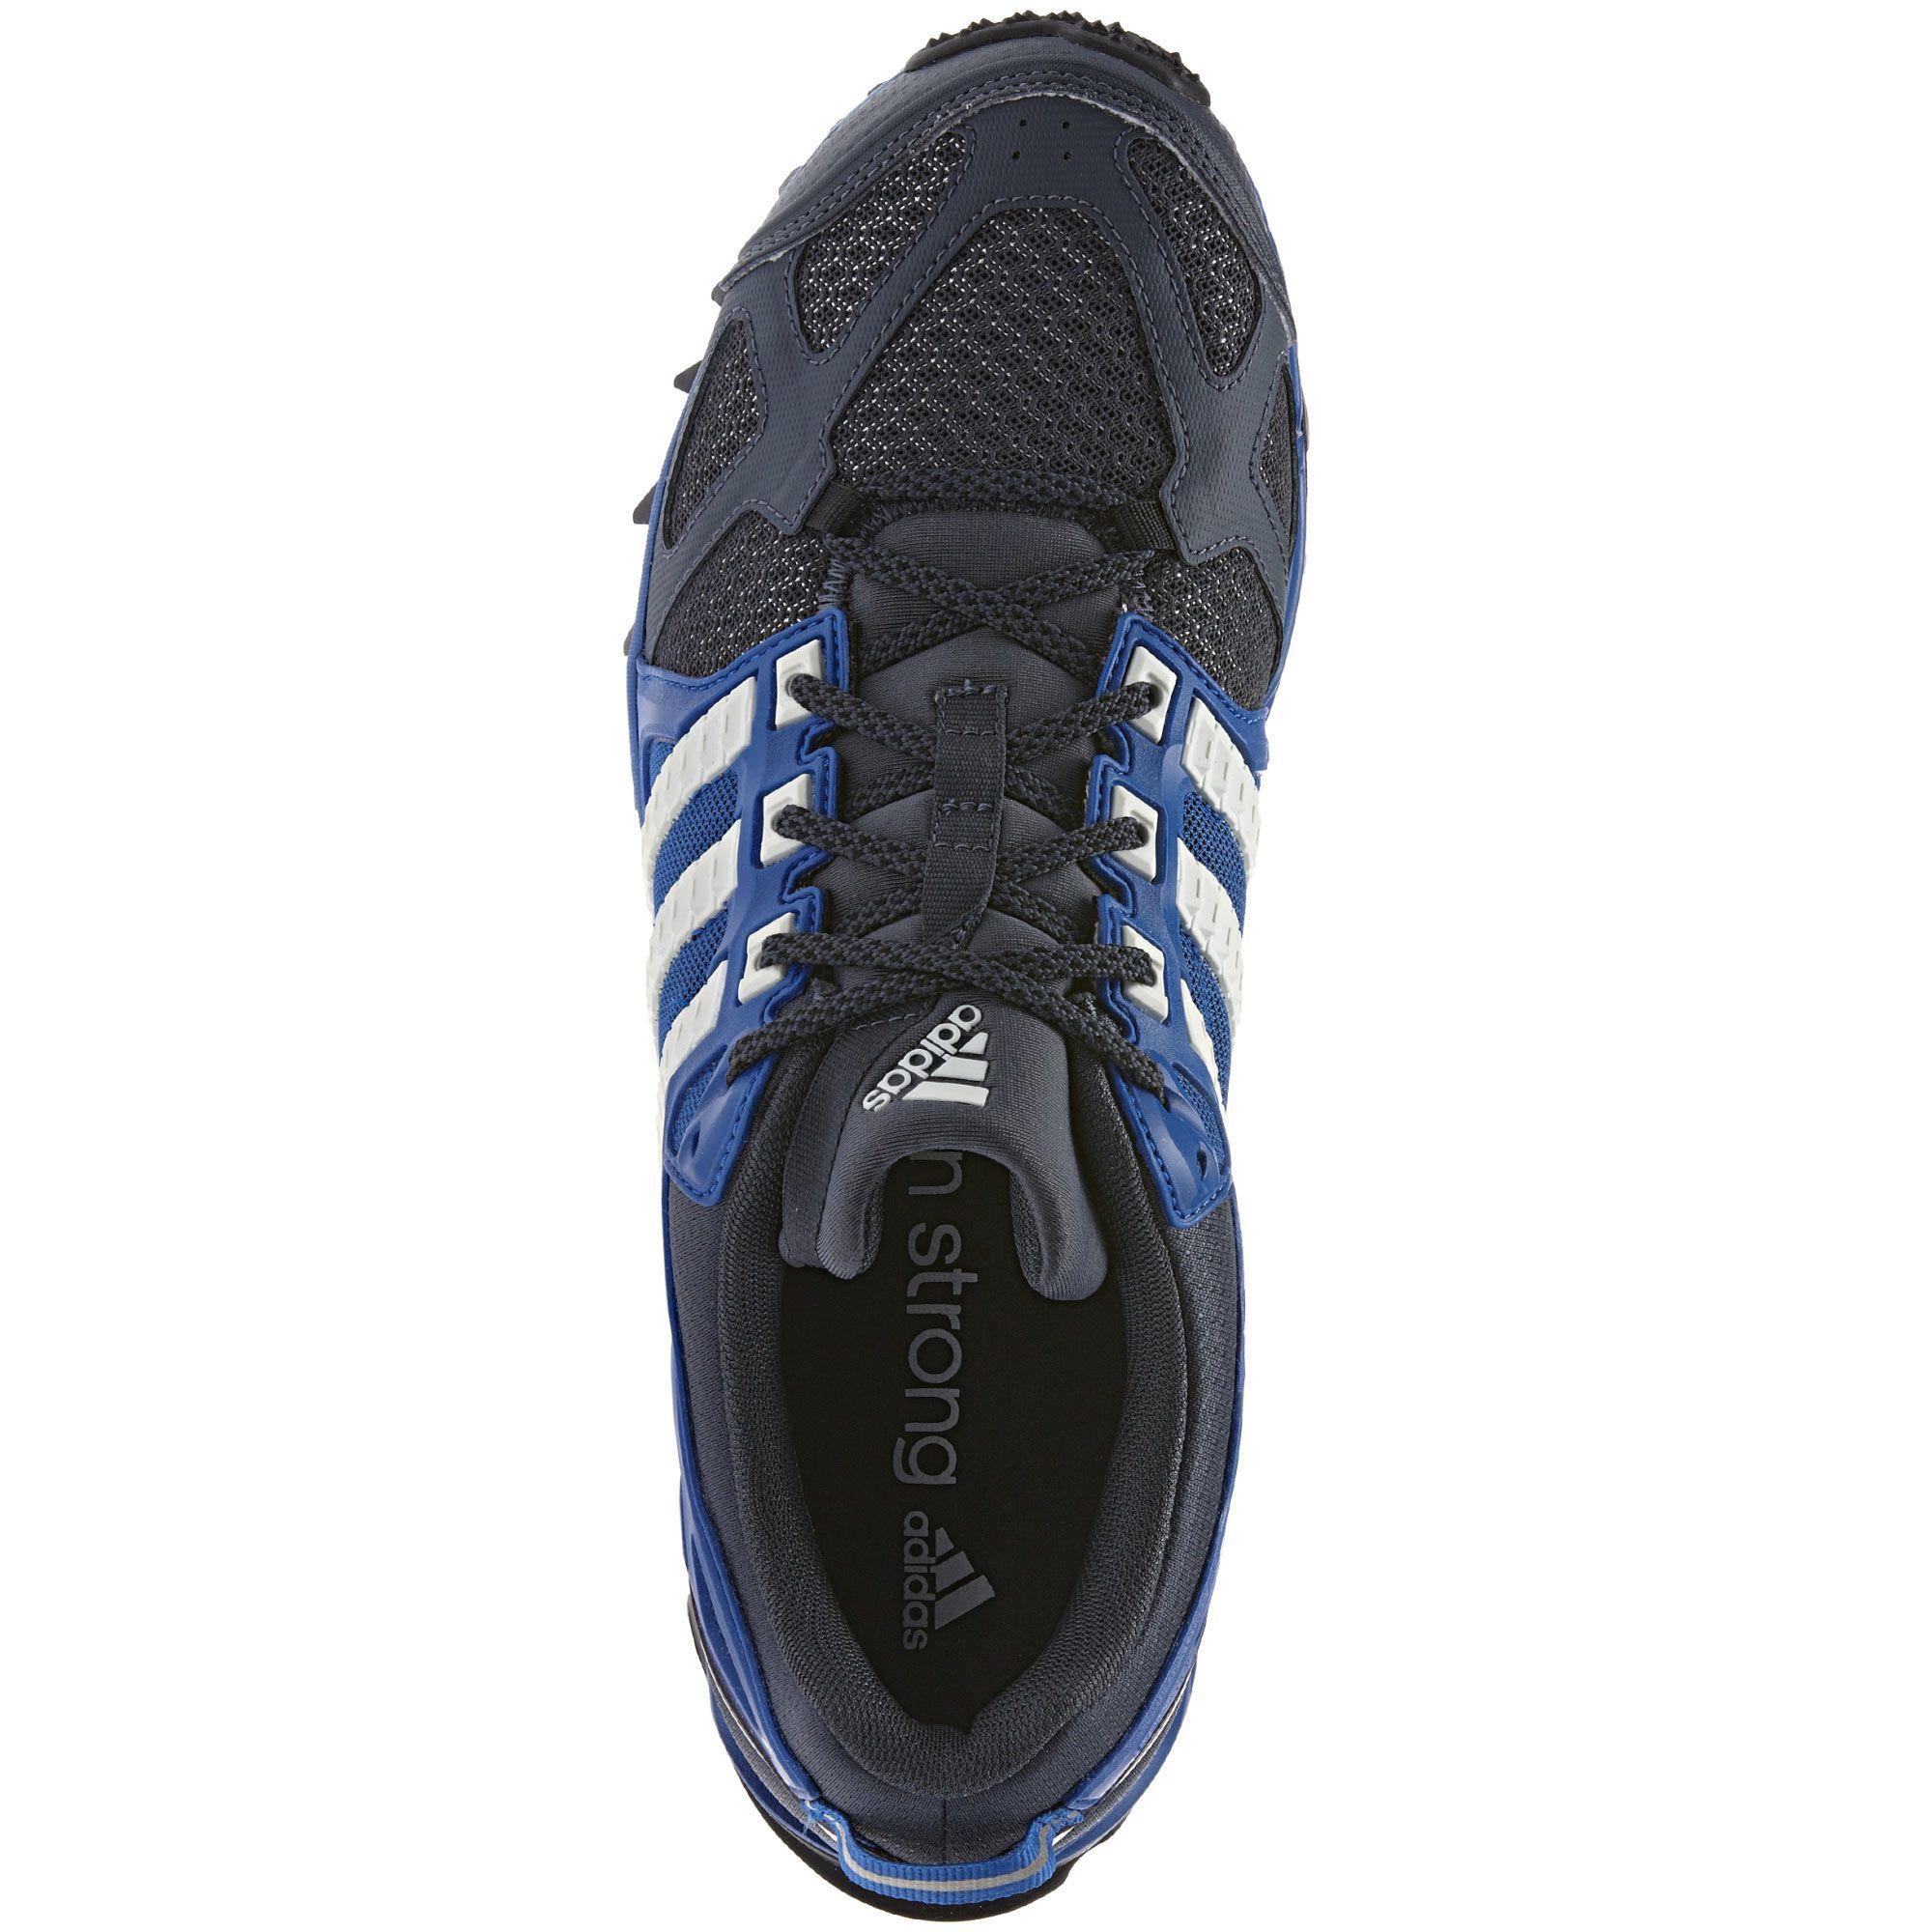 653d6f17755 adidas - Kanadia Trail 6 Shoes